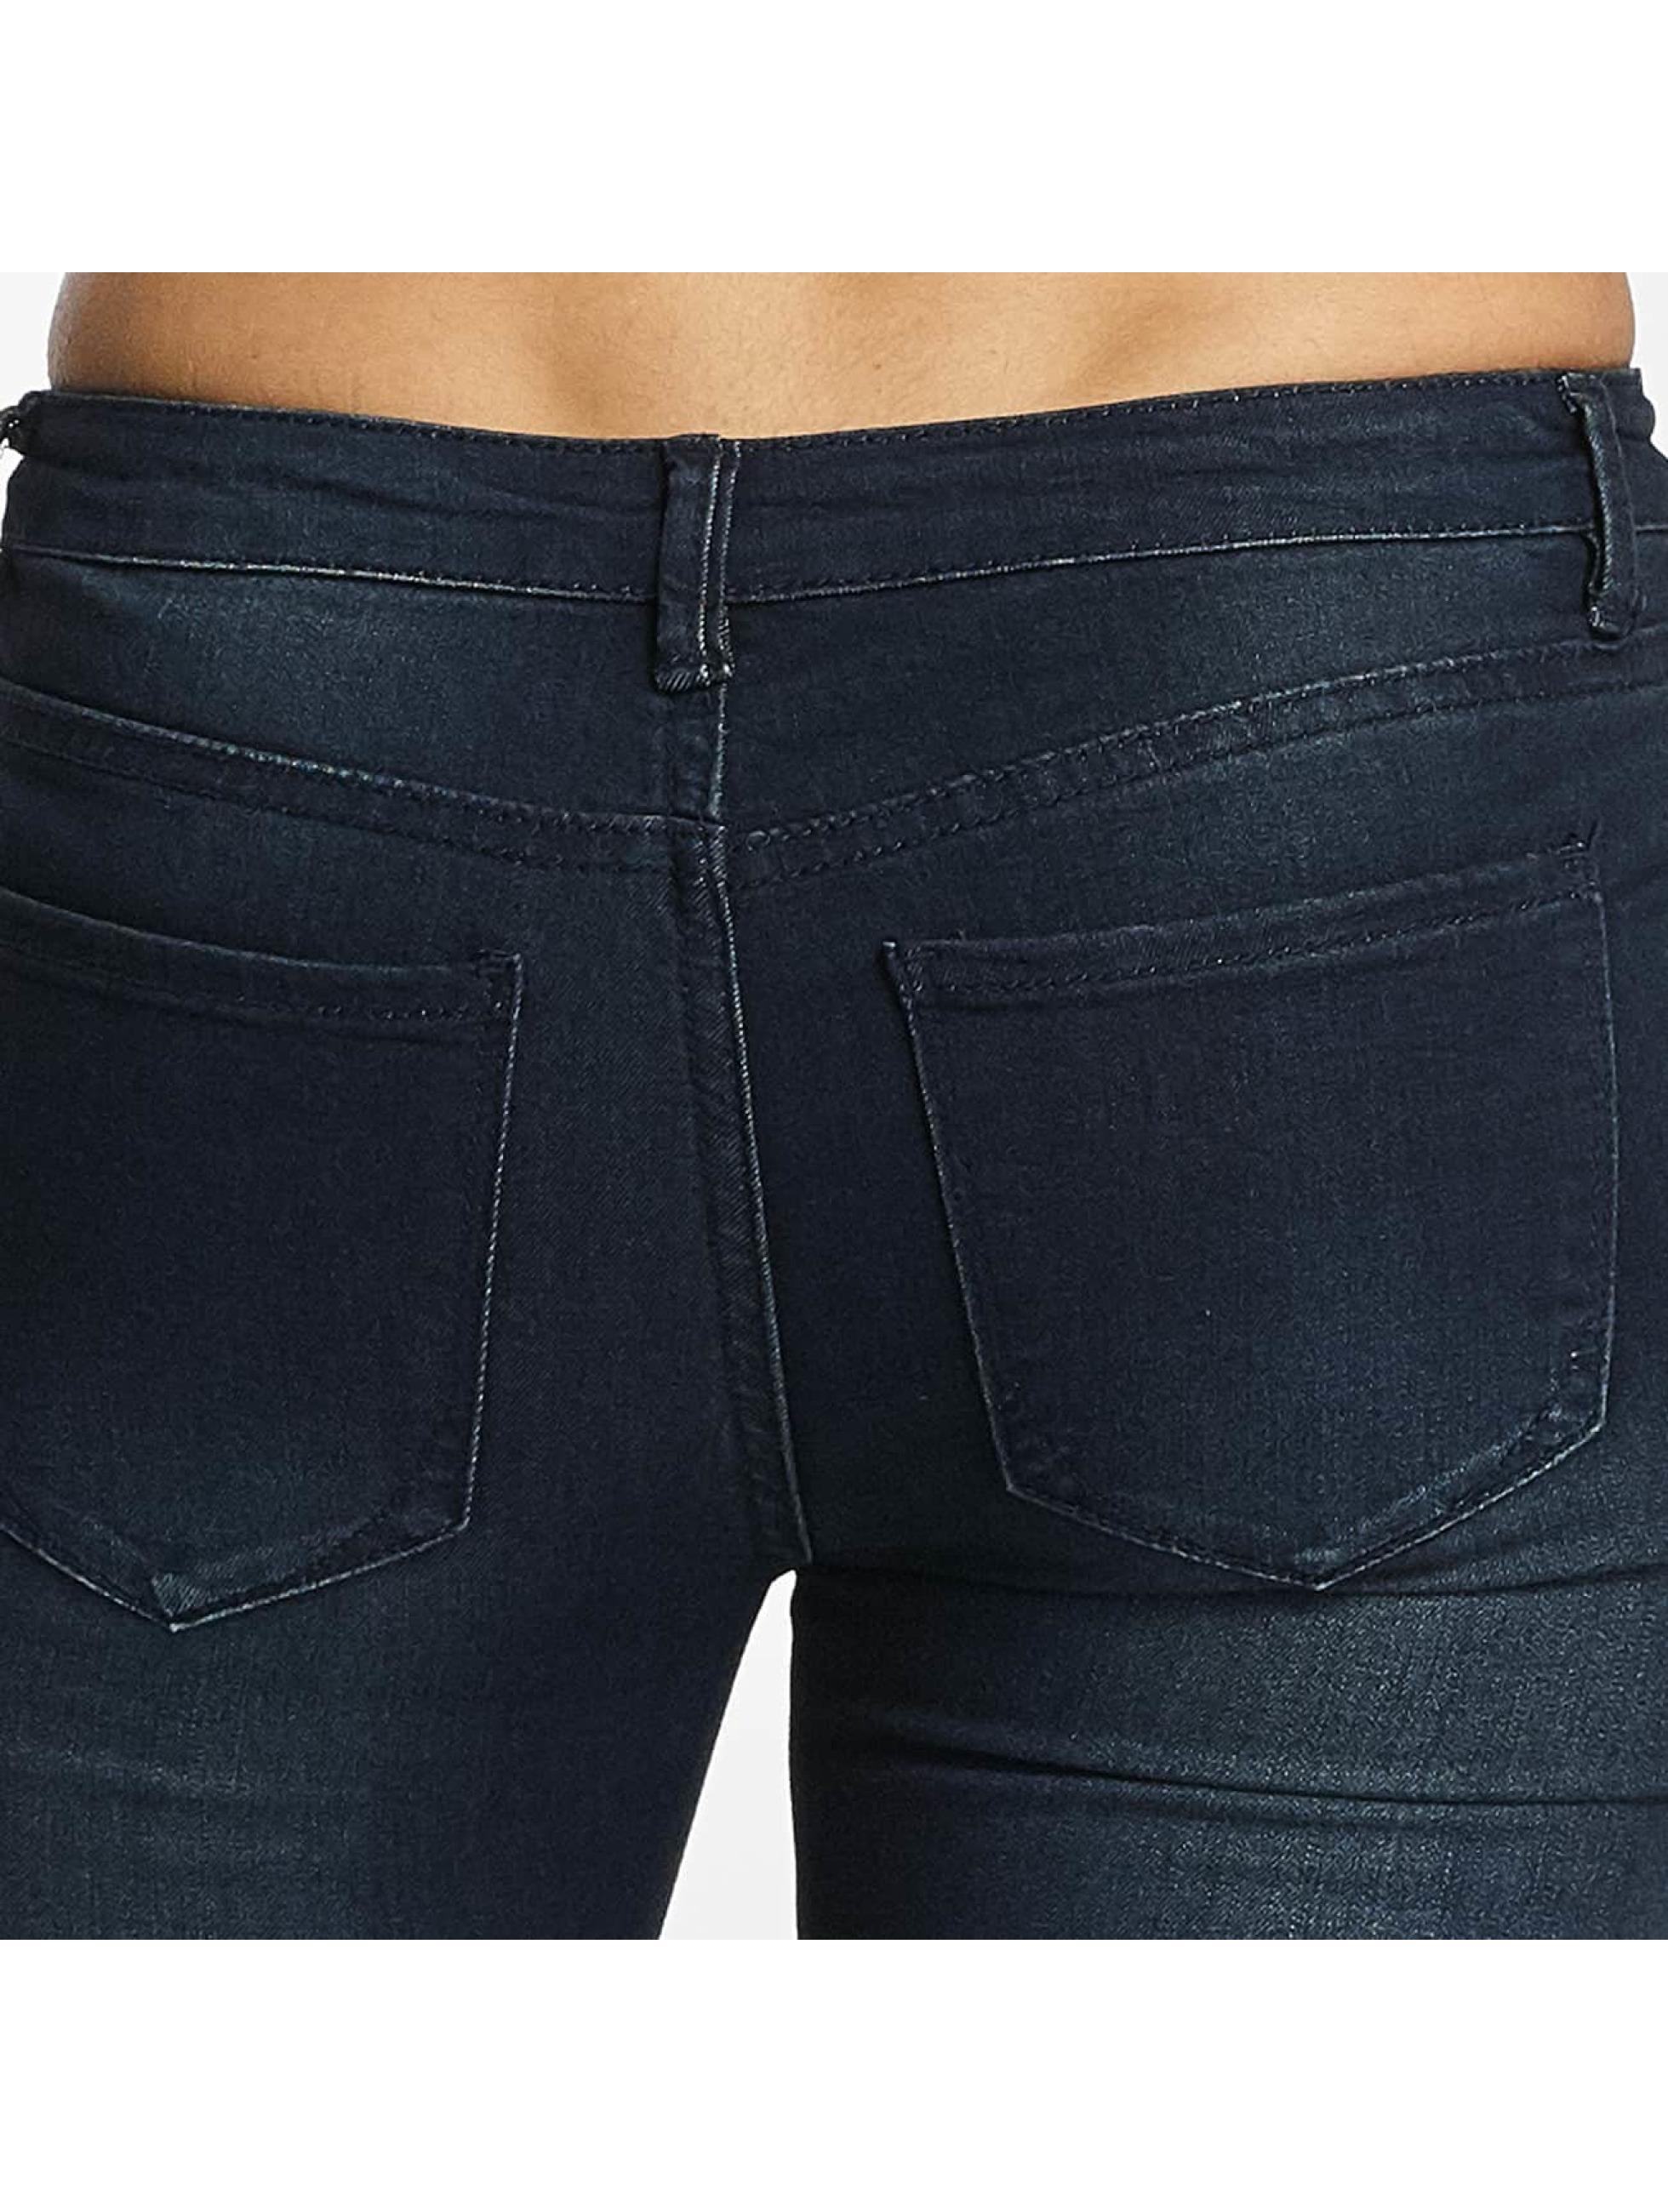 Hailys Tynne bukser Mia Basic svart